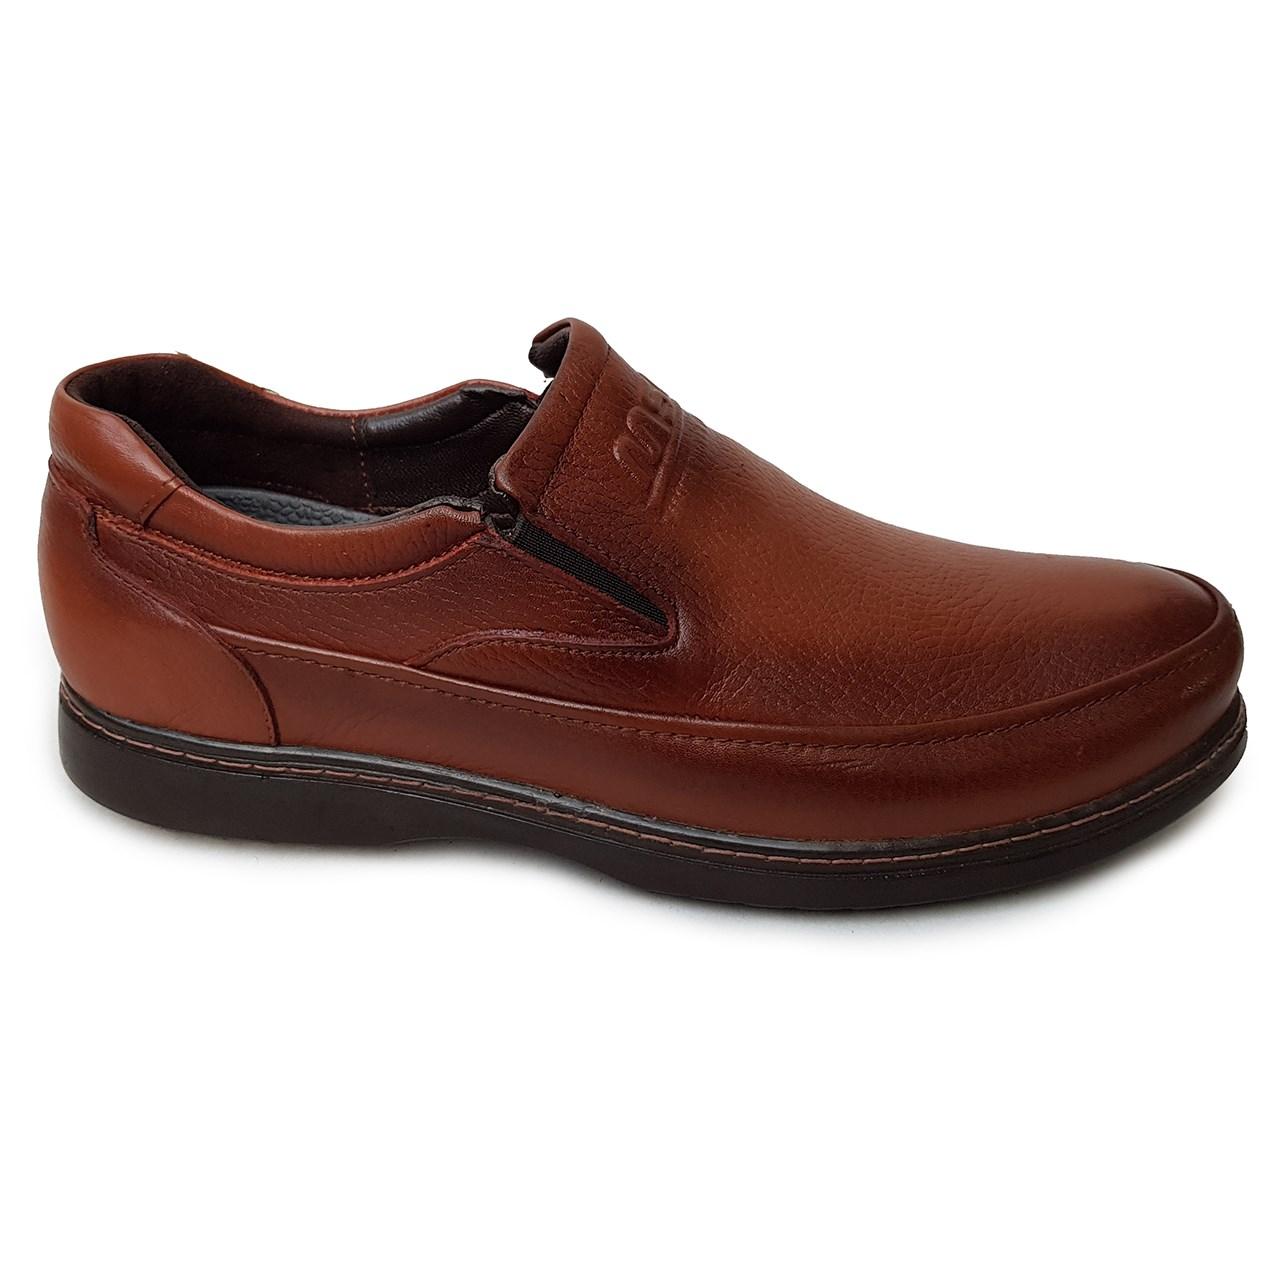 کفش مردانه چرم طبیعی دیاکو مدلMSL-PETRO-K-HONEY